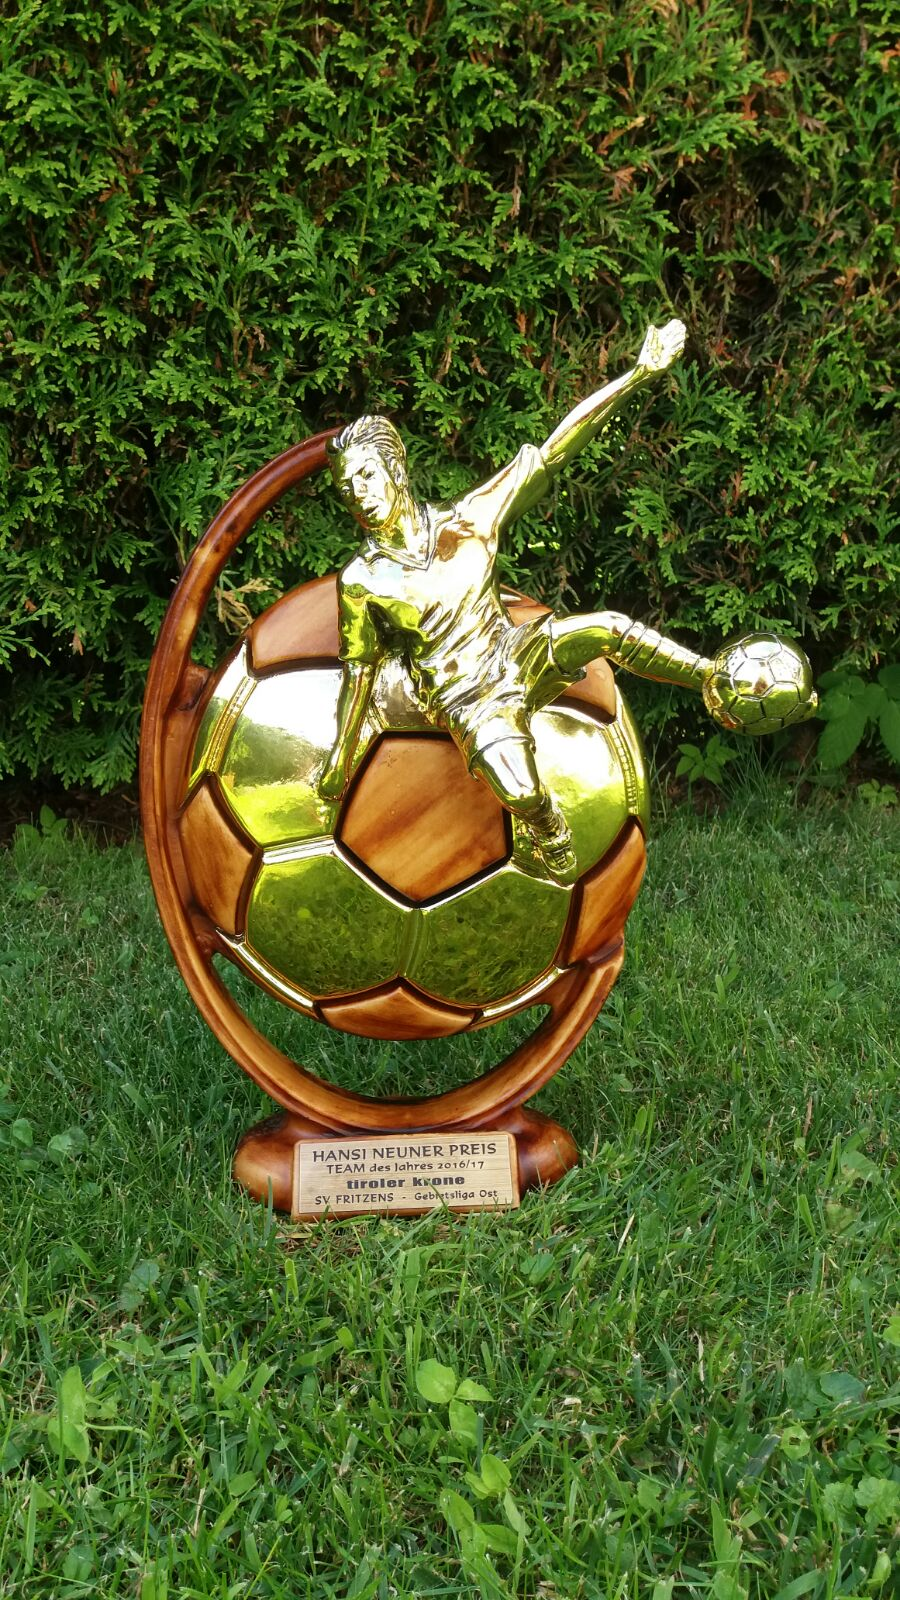 Team des Jahres - Pokal